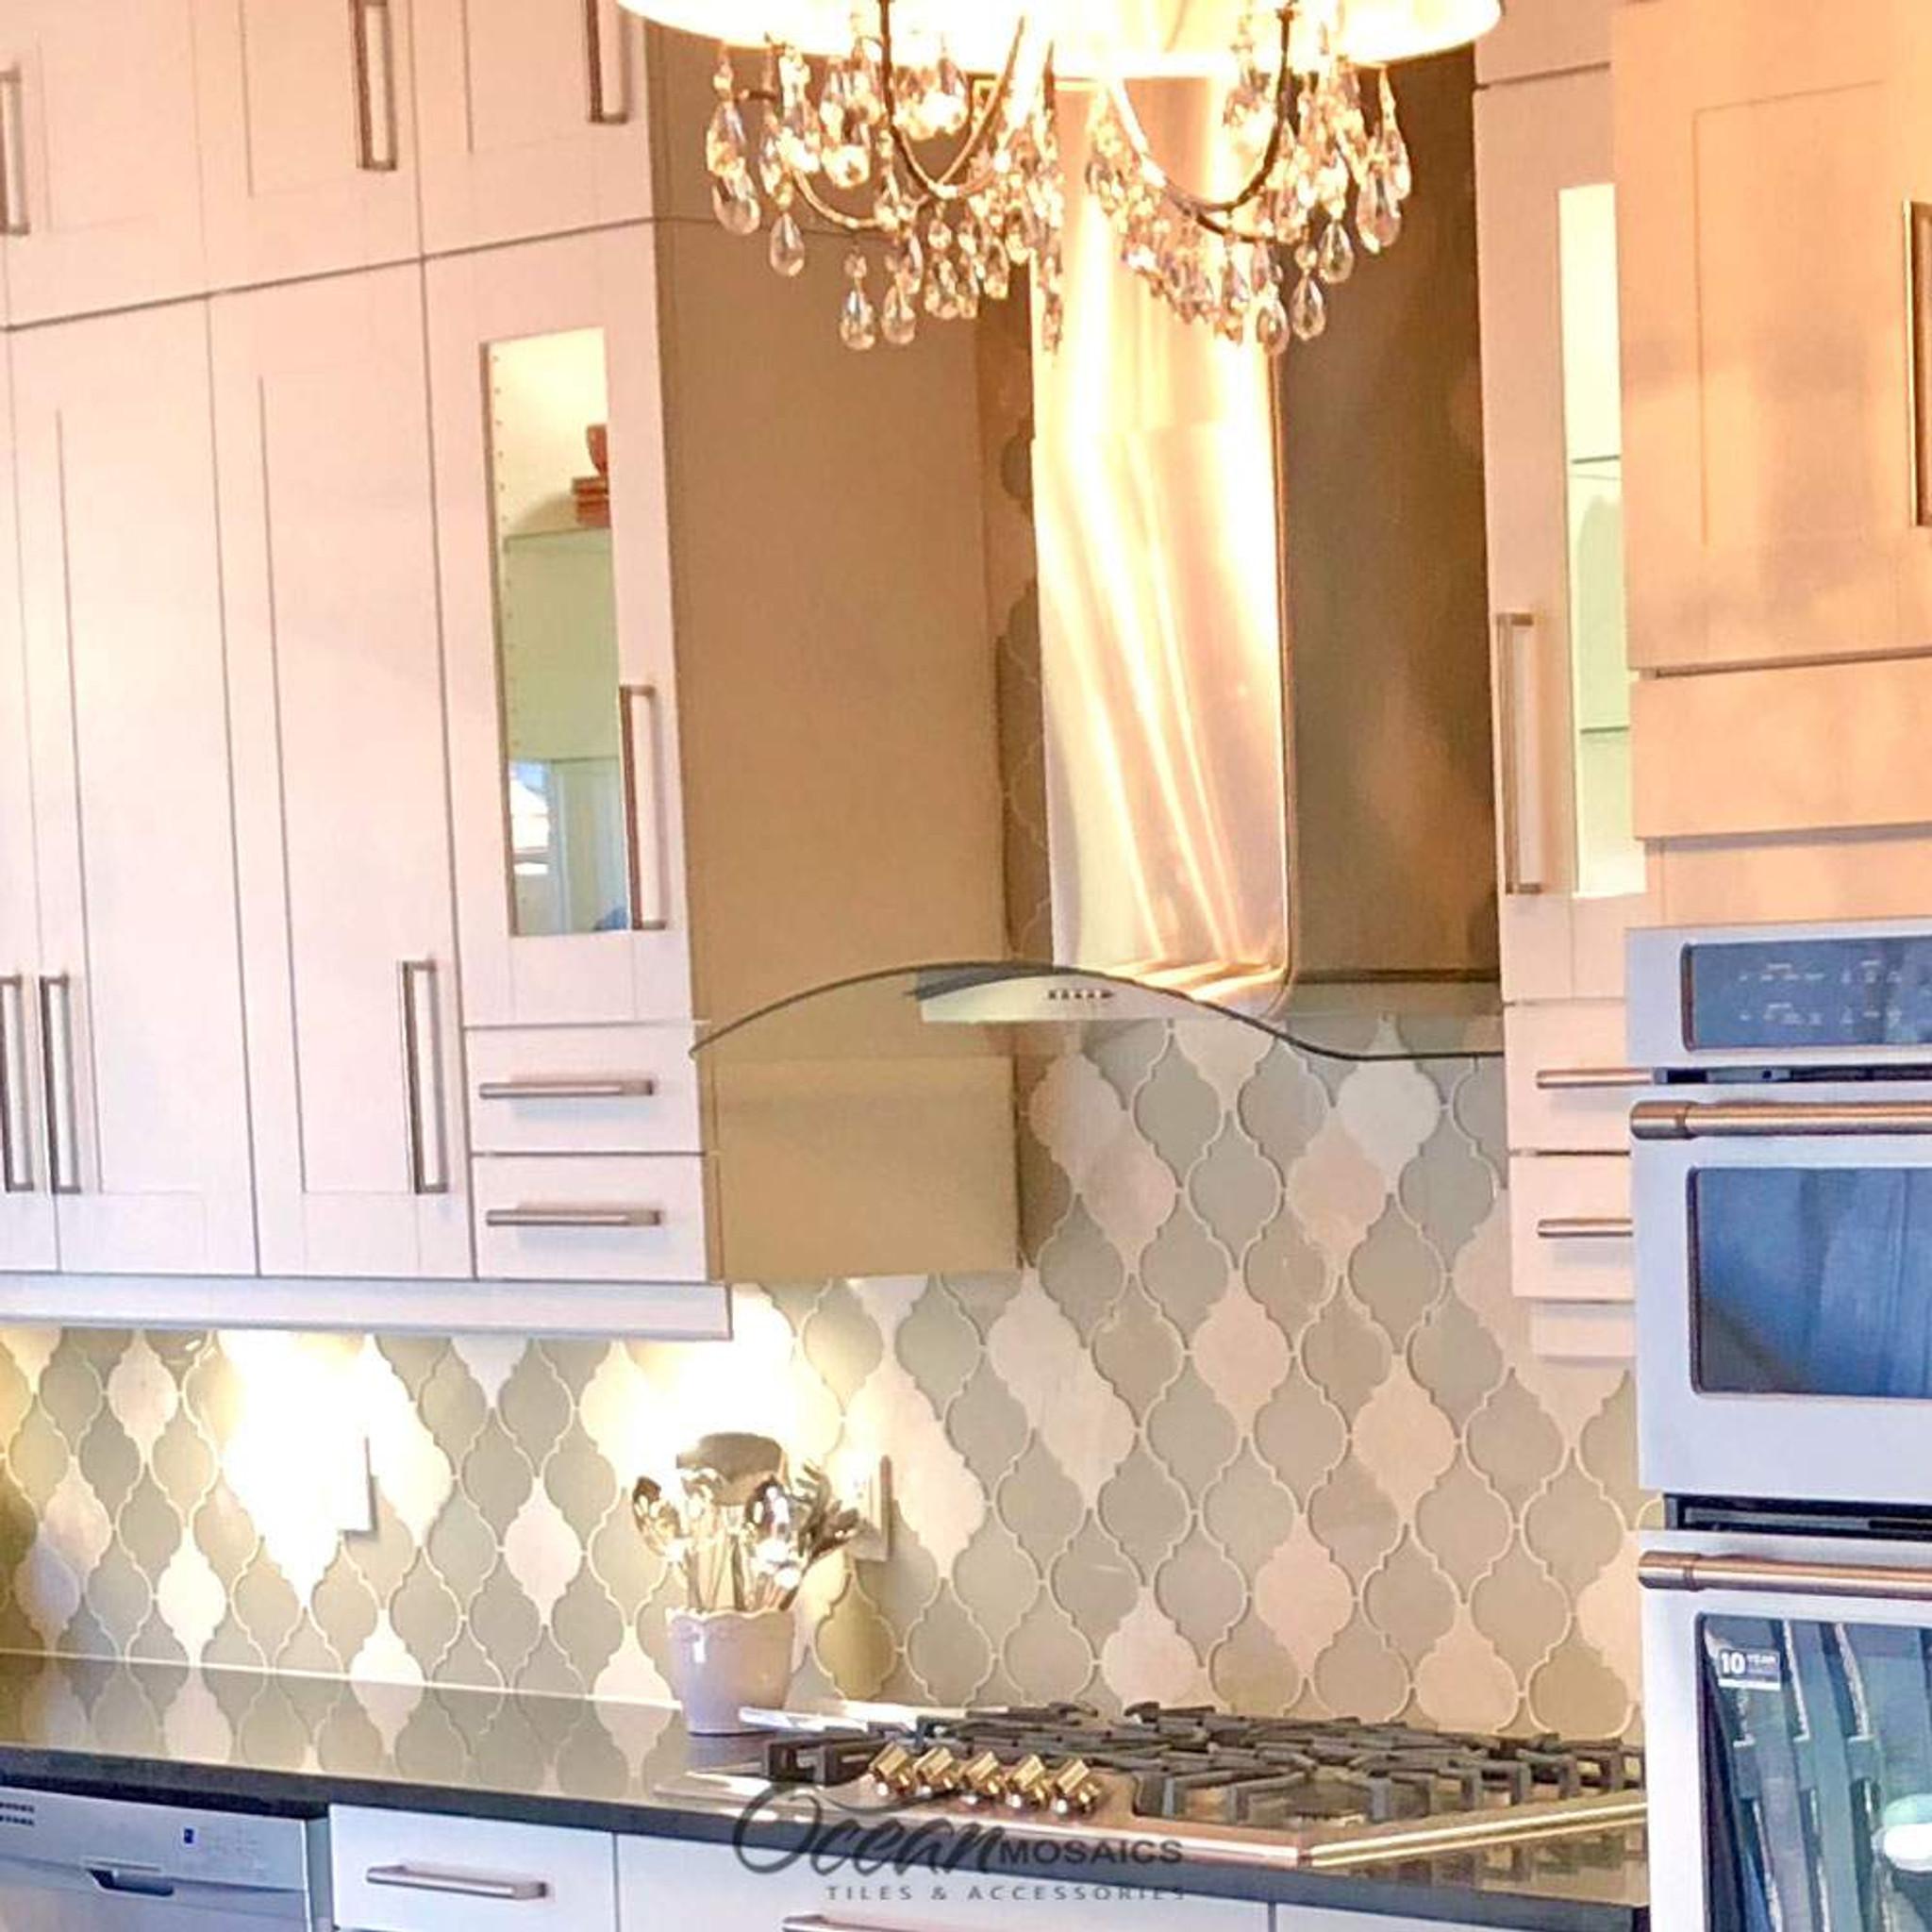 - Clover Arabesque Crema Mosaic Glass Tile